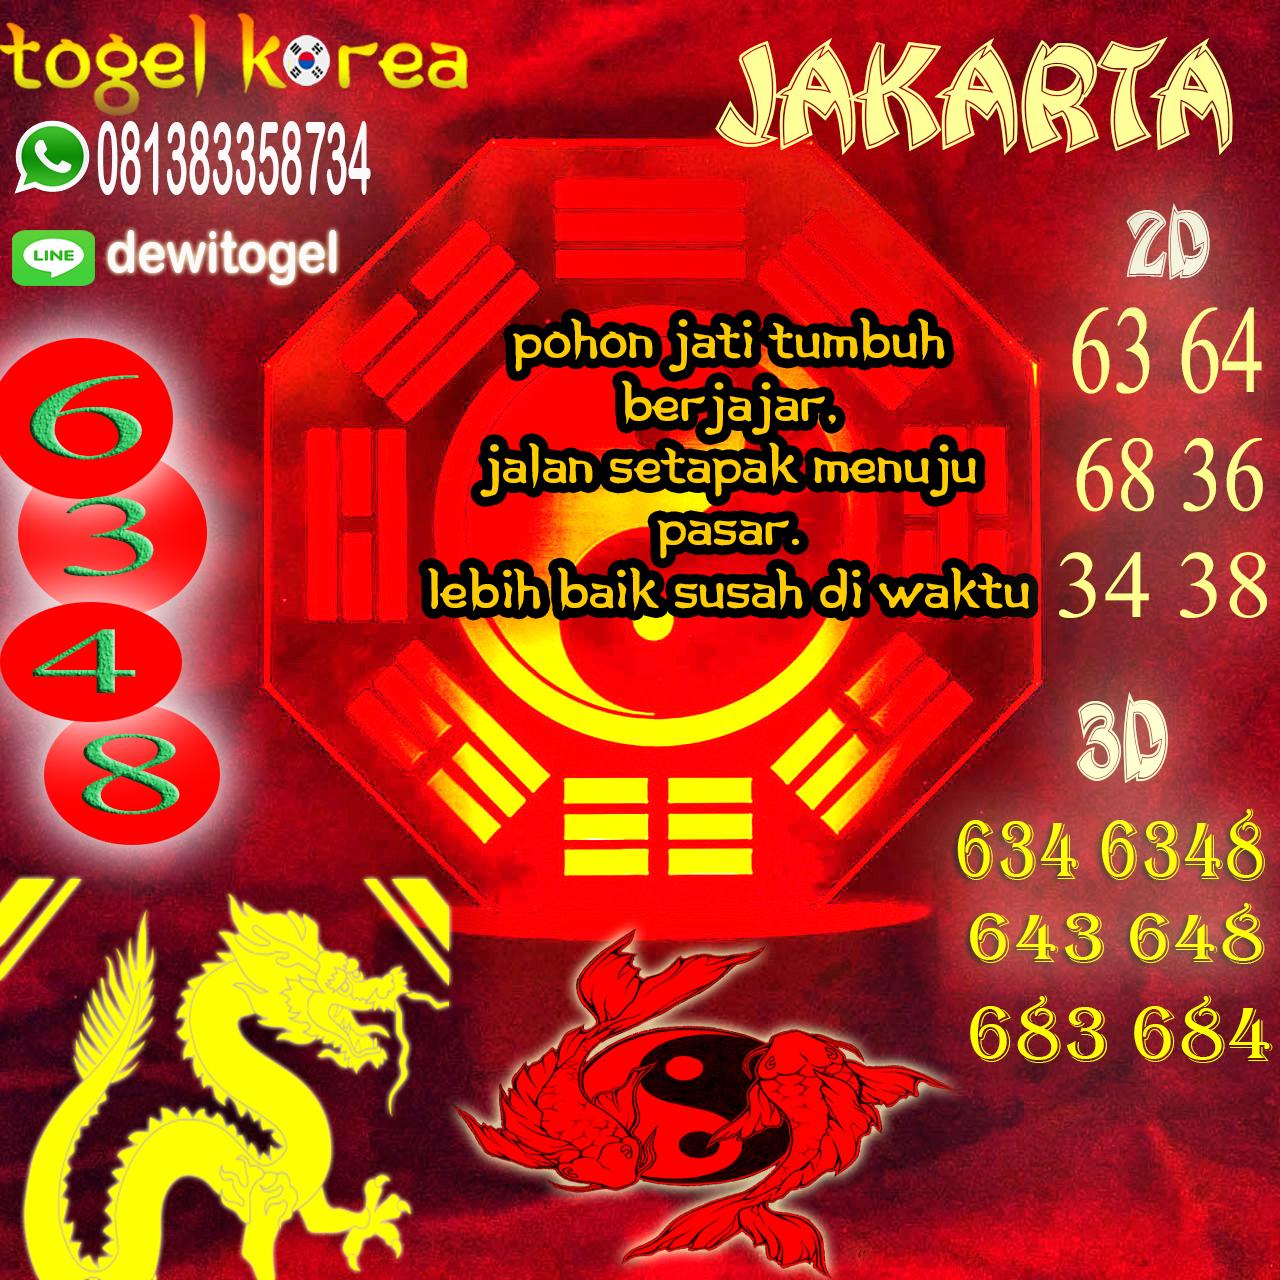 PREDIKSI JITU JAKARTA (JKT) 10 AGUSTUS 2020